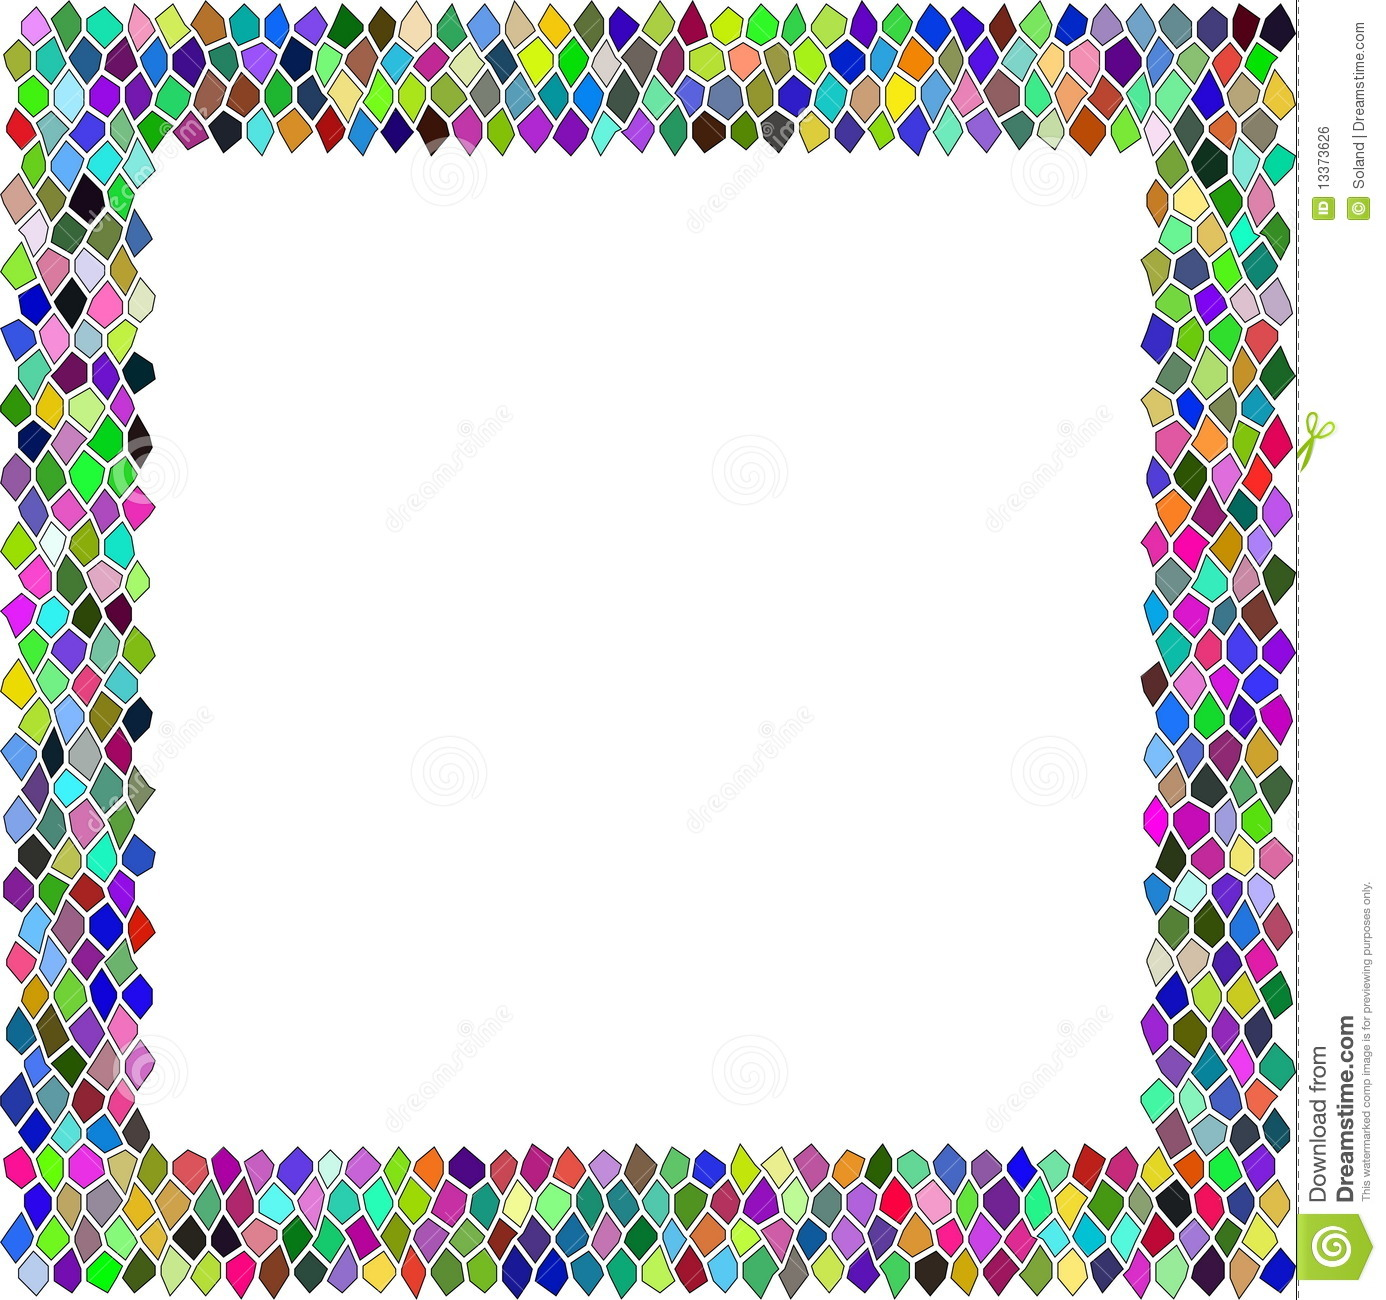 1386x1300 Clip Art Mosaic Clip Art